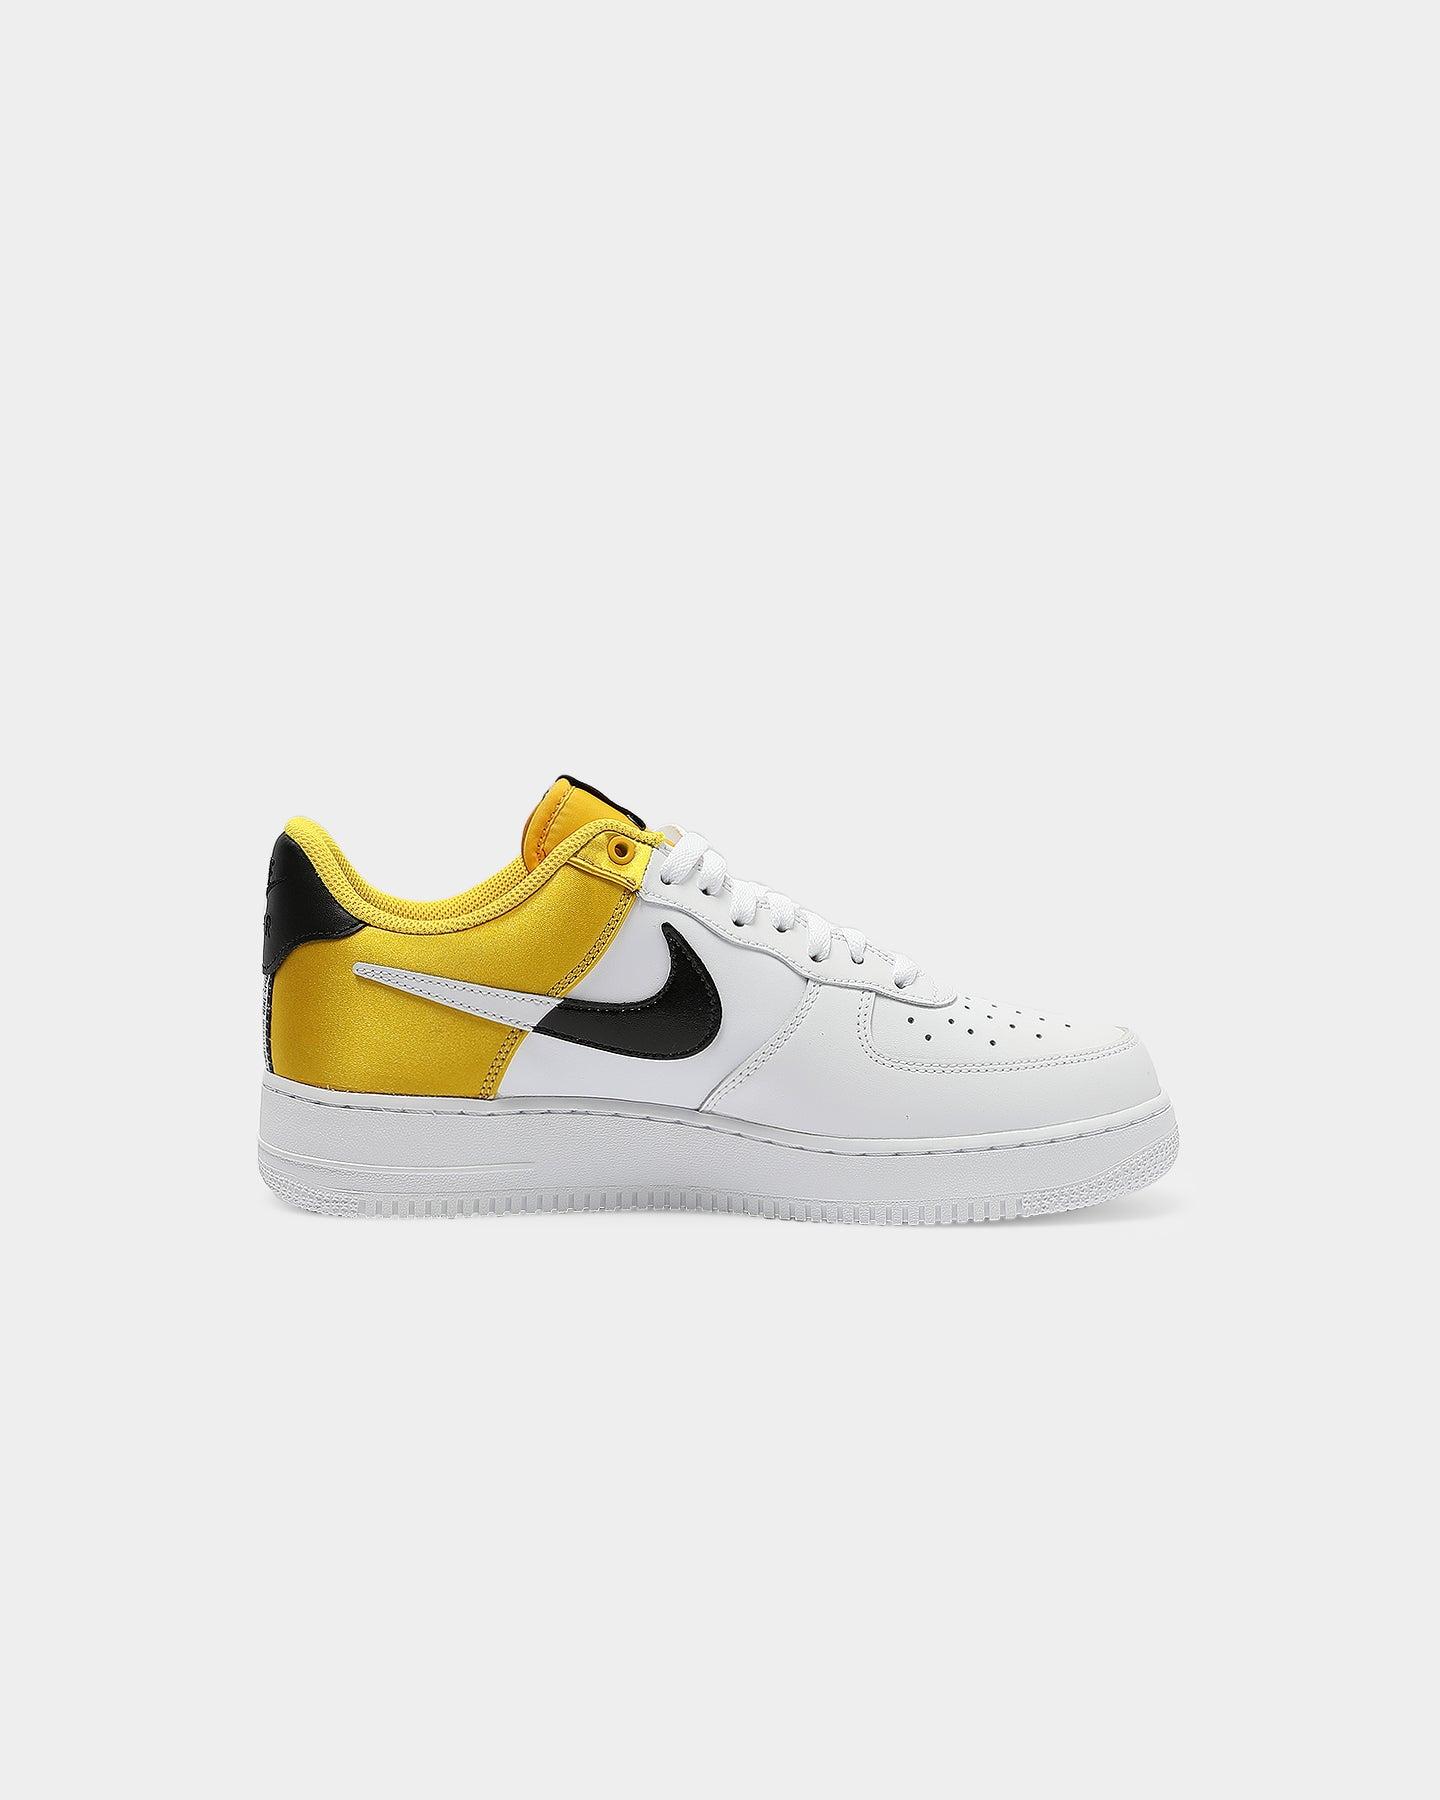 nike air force 1 nba low yellow